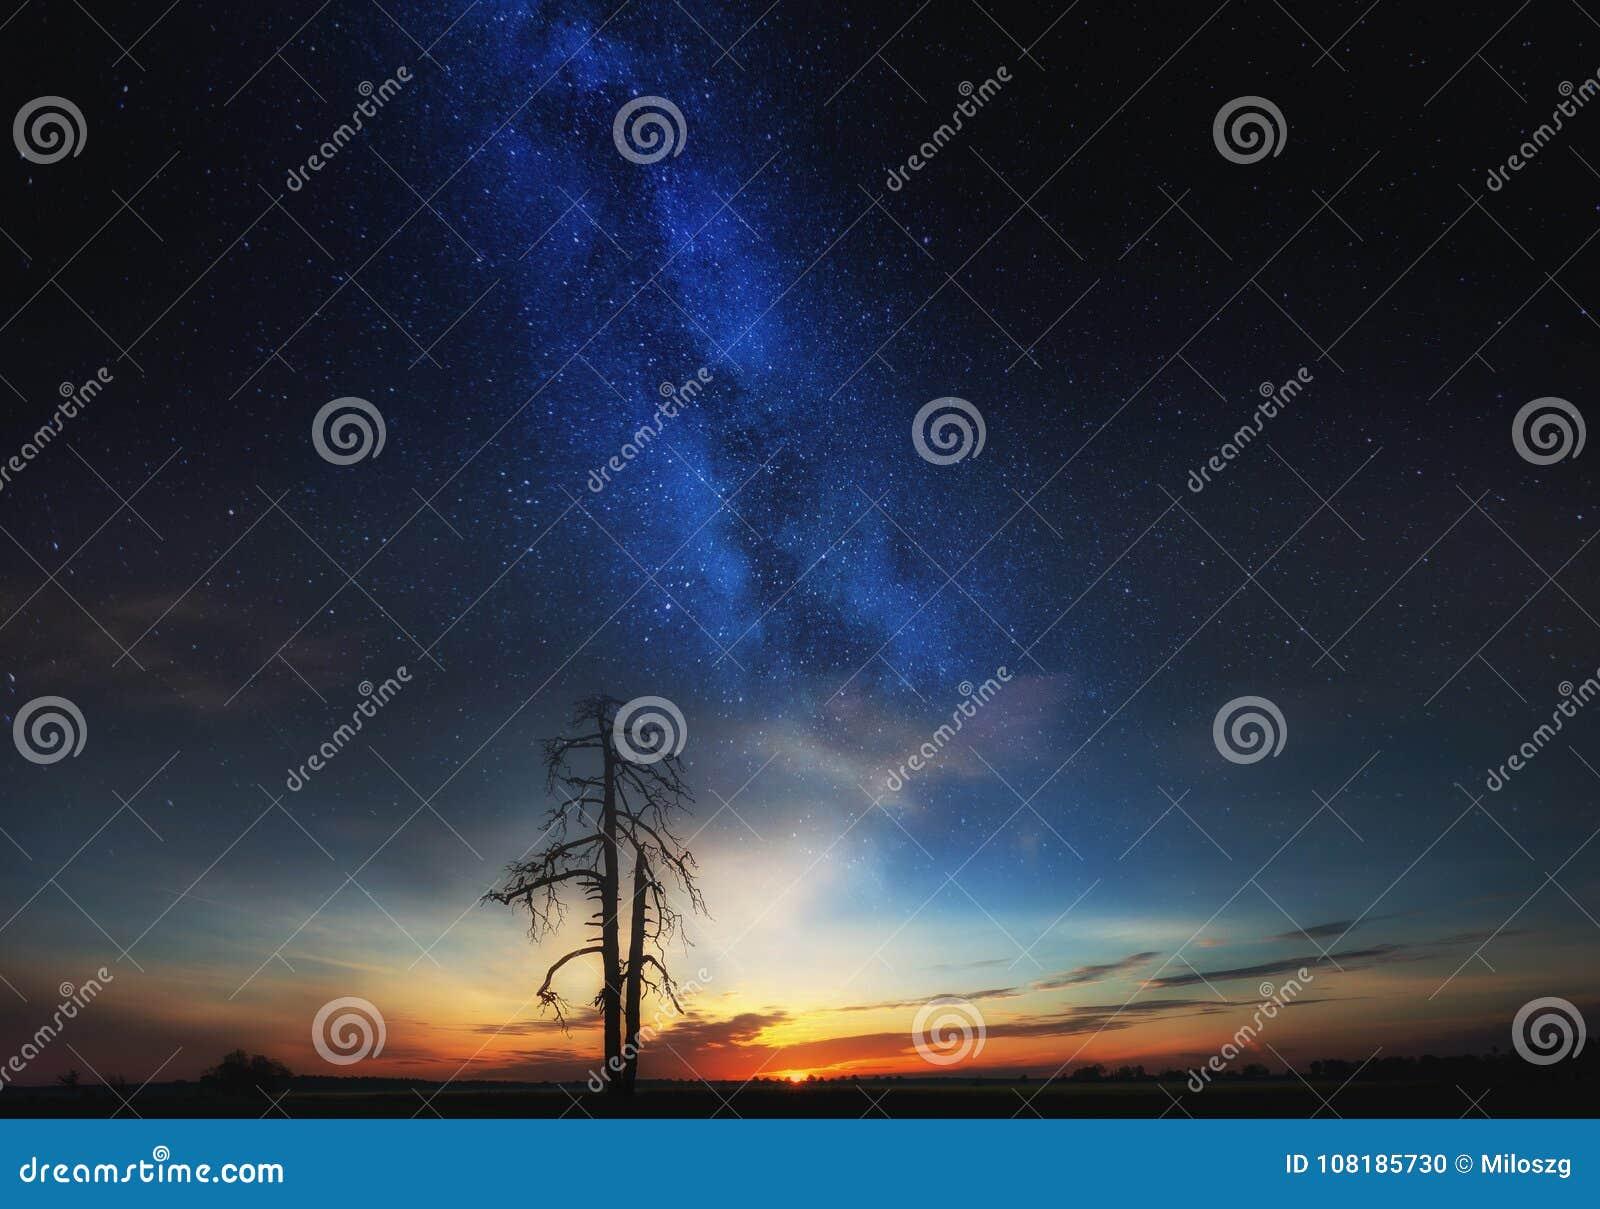 Starry sky over field and dead tree, fine art landscape